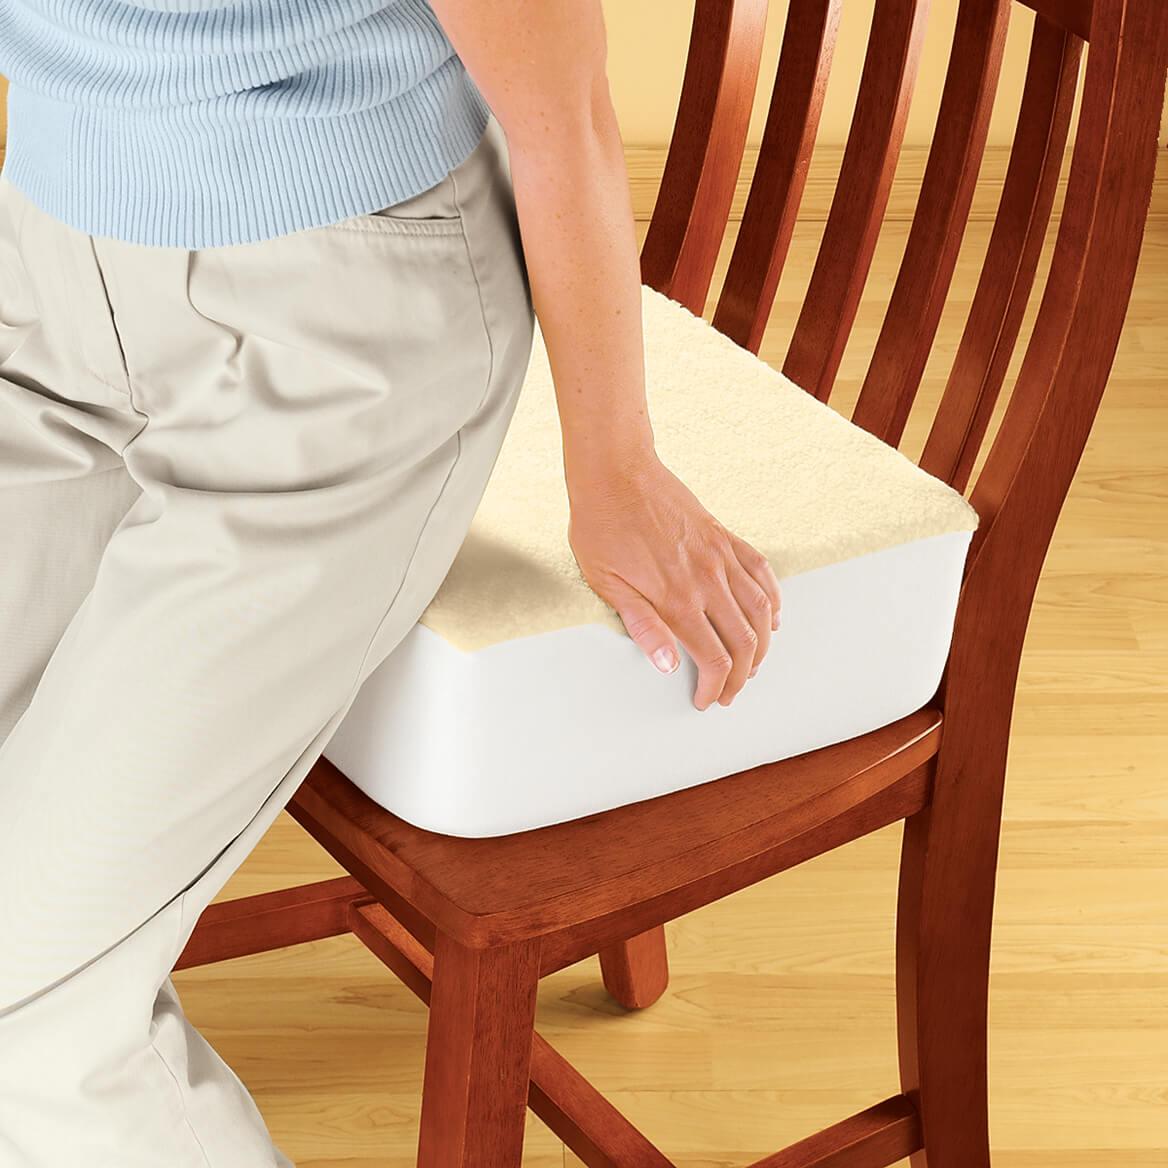 Easy Rise Cushion-Firm Density-302544